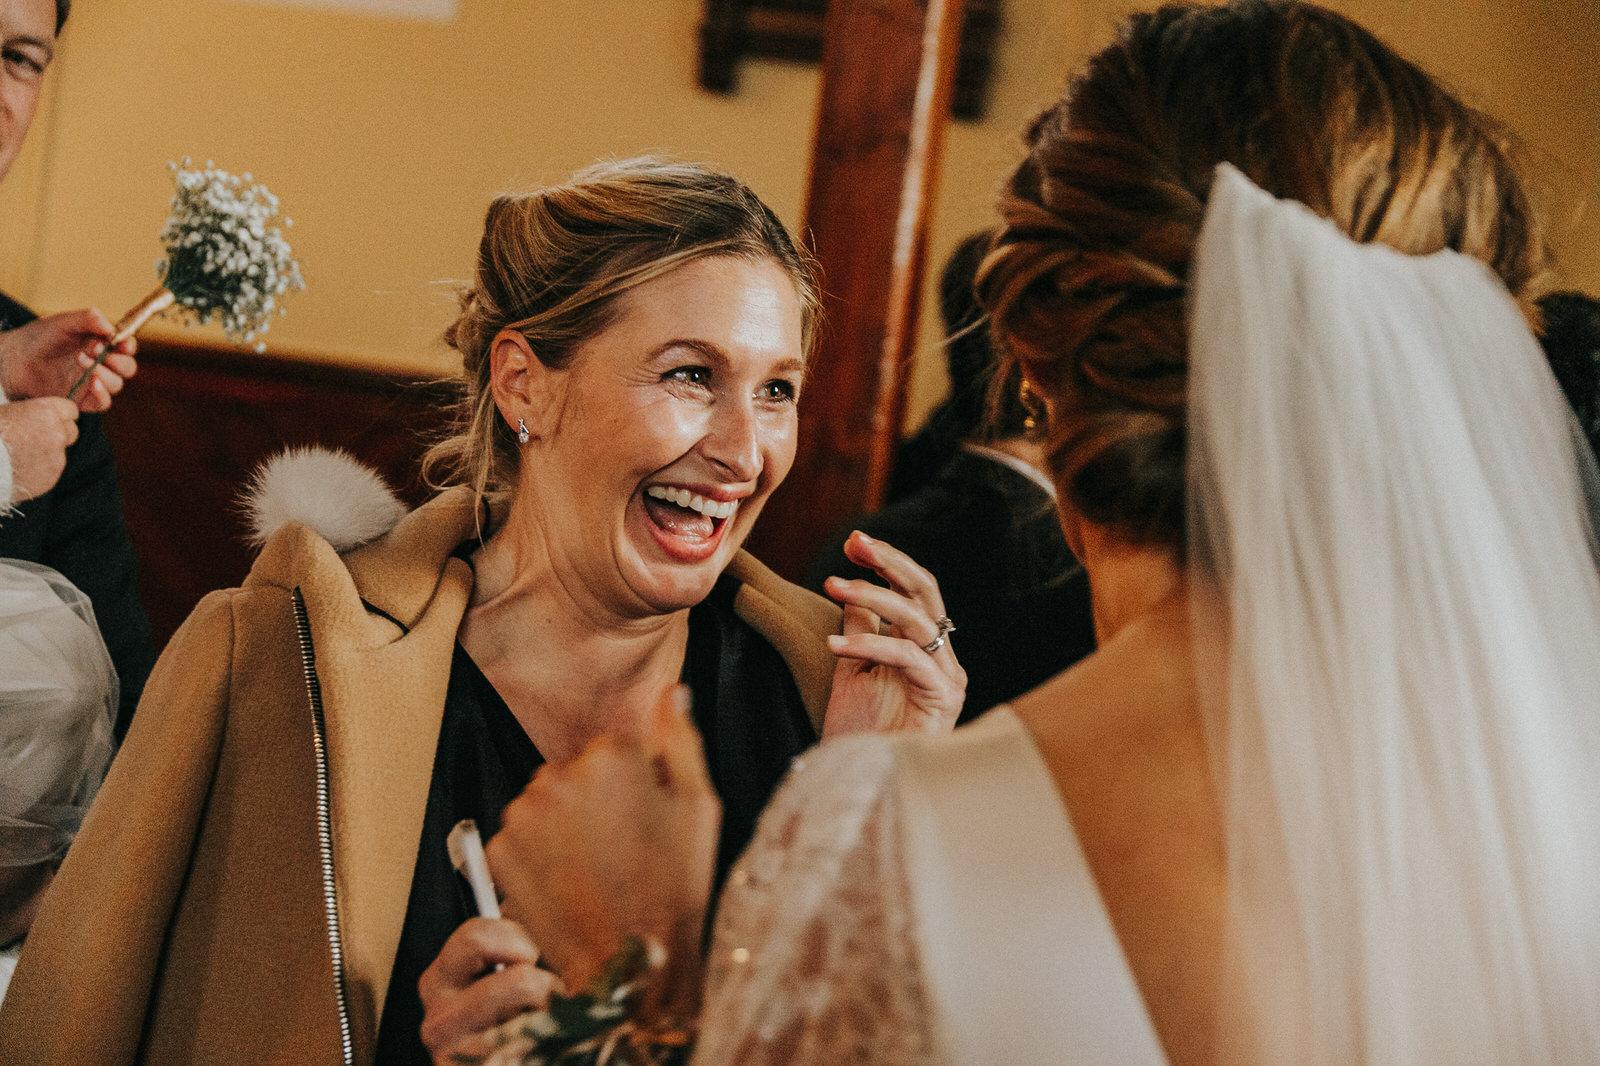 Dunbrody_House_Wedding_photographer_082.jpg